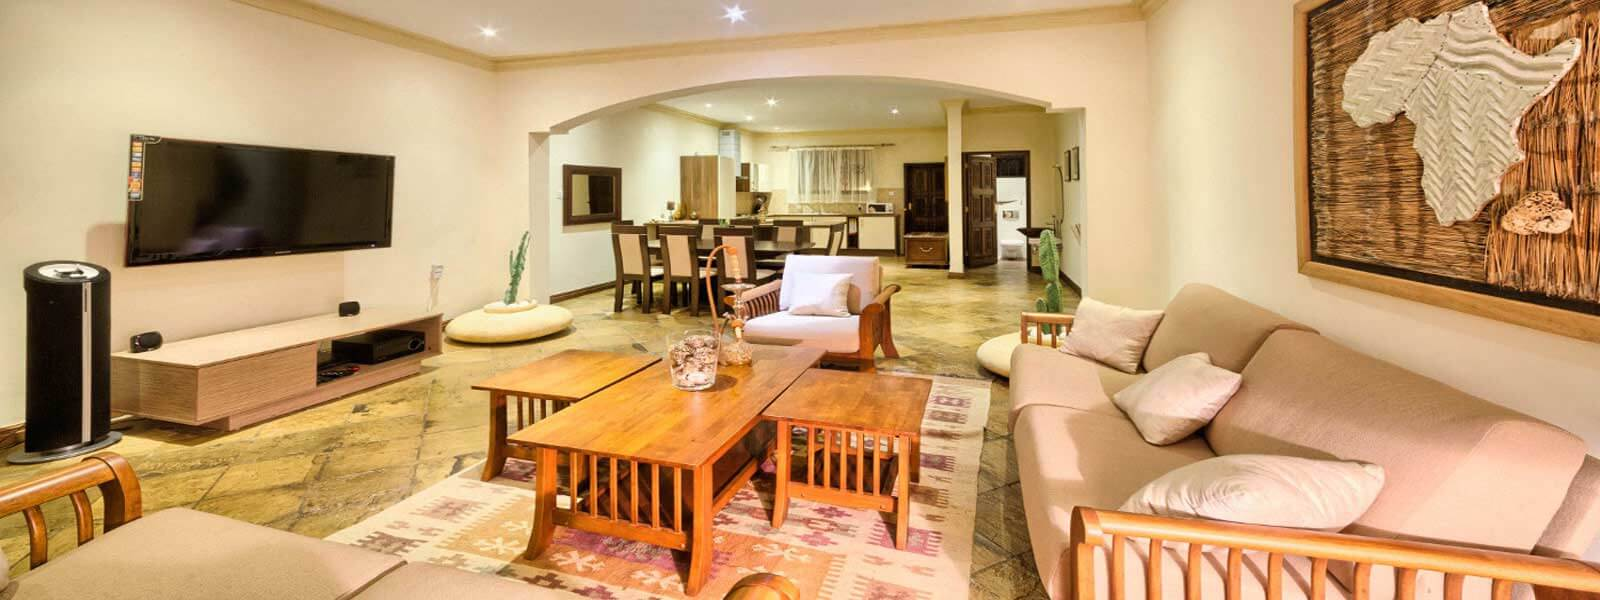 Apartments Kenya EuroTrust Real Estate